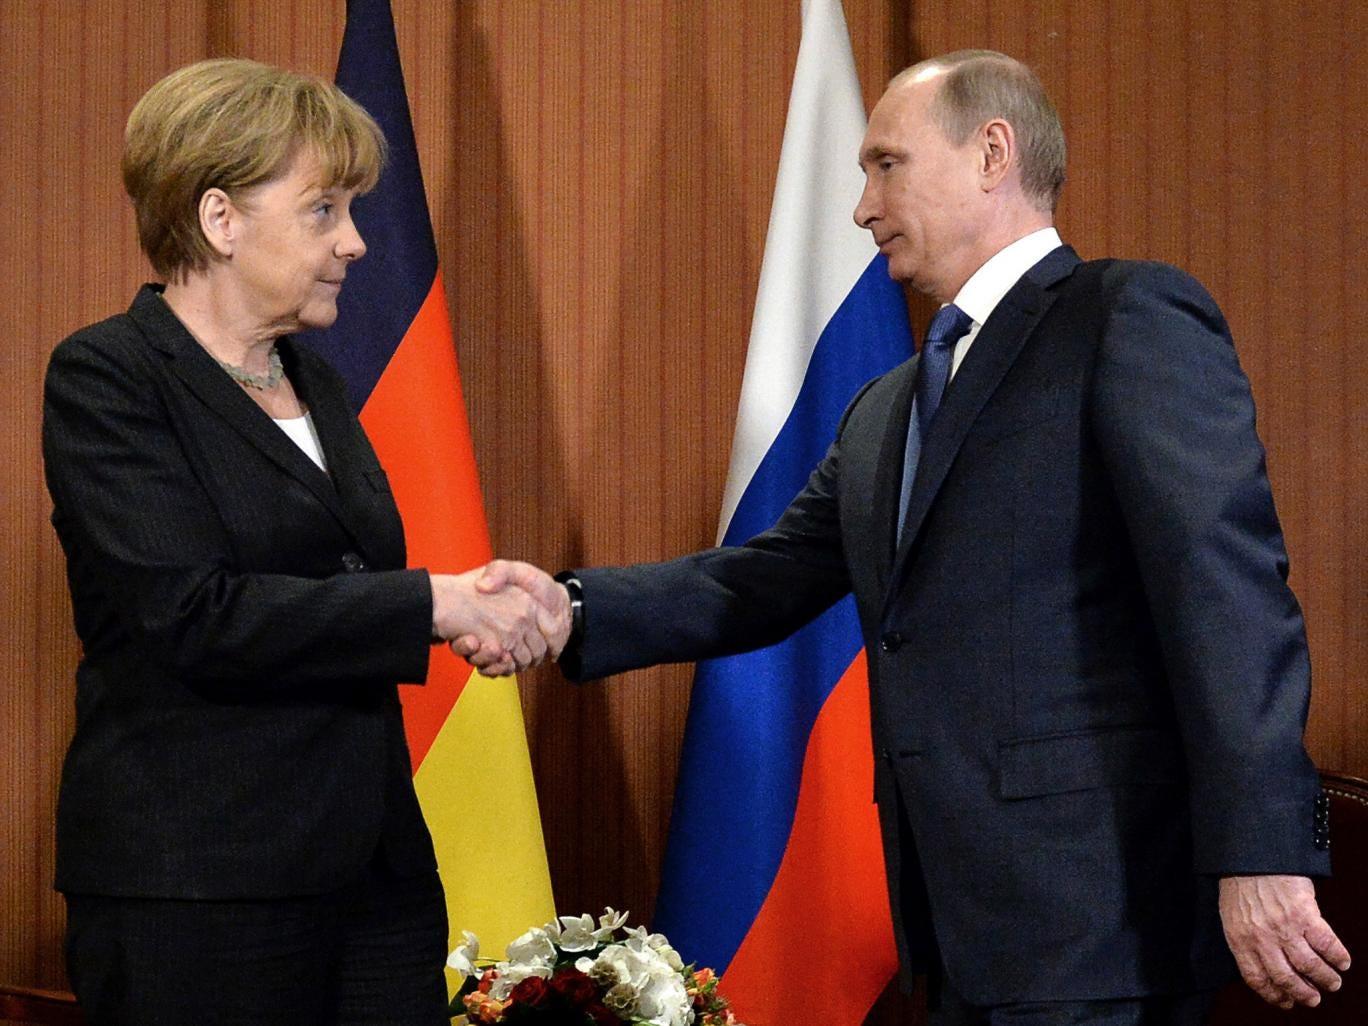 Russian President Vladimir Putin shakes hand with German chancellor Angela Merkel, during a meeting last month